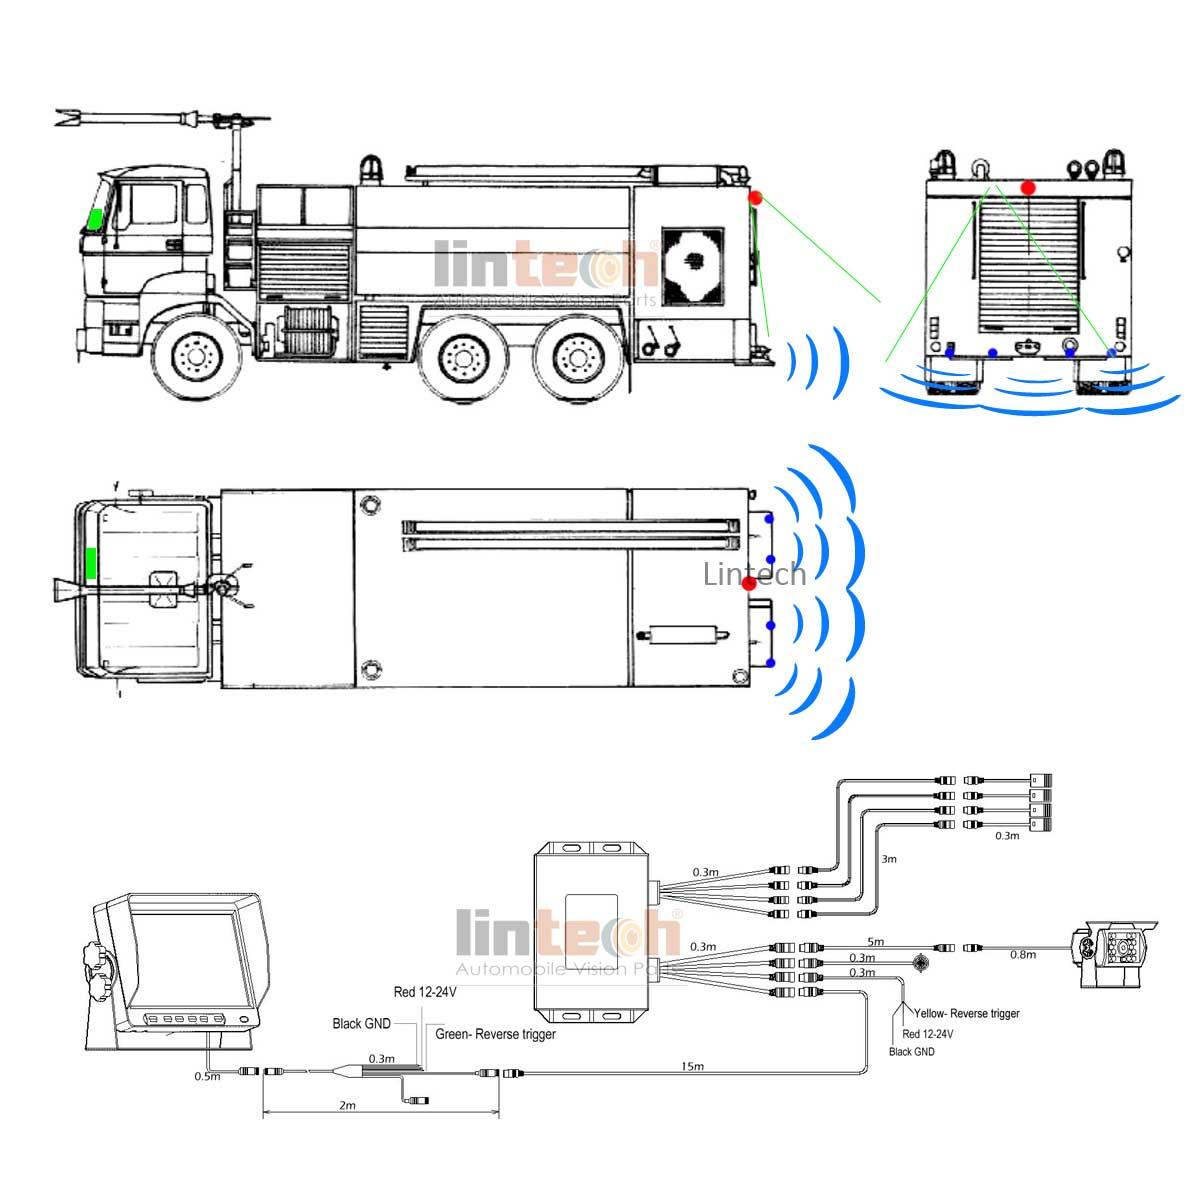 [ANLQ_8698]  VD_4867] 4 Guys Fire Truck Wiring Diagram Download Diagram | Vision Car Alarm Wiring Diagram |  | Feren Osuri Oxyl Inki Syny Athid Cular Dhjem Ymoon Rdona Hapolo  Mohammedshrine Librar Wiring 101